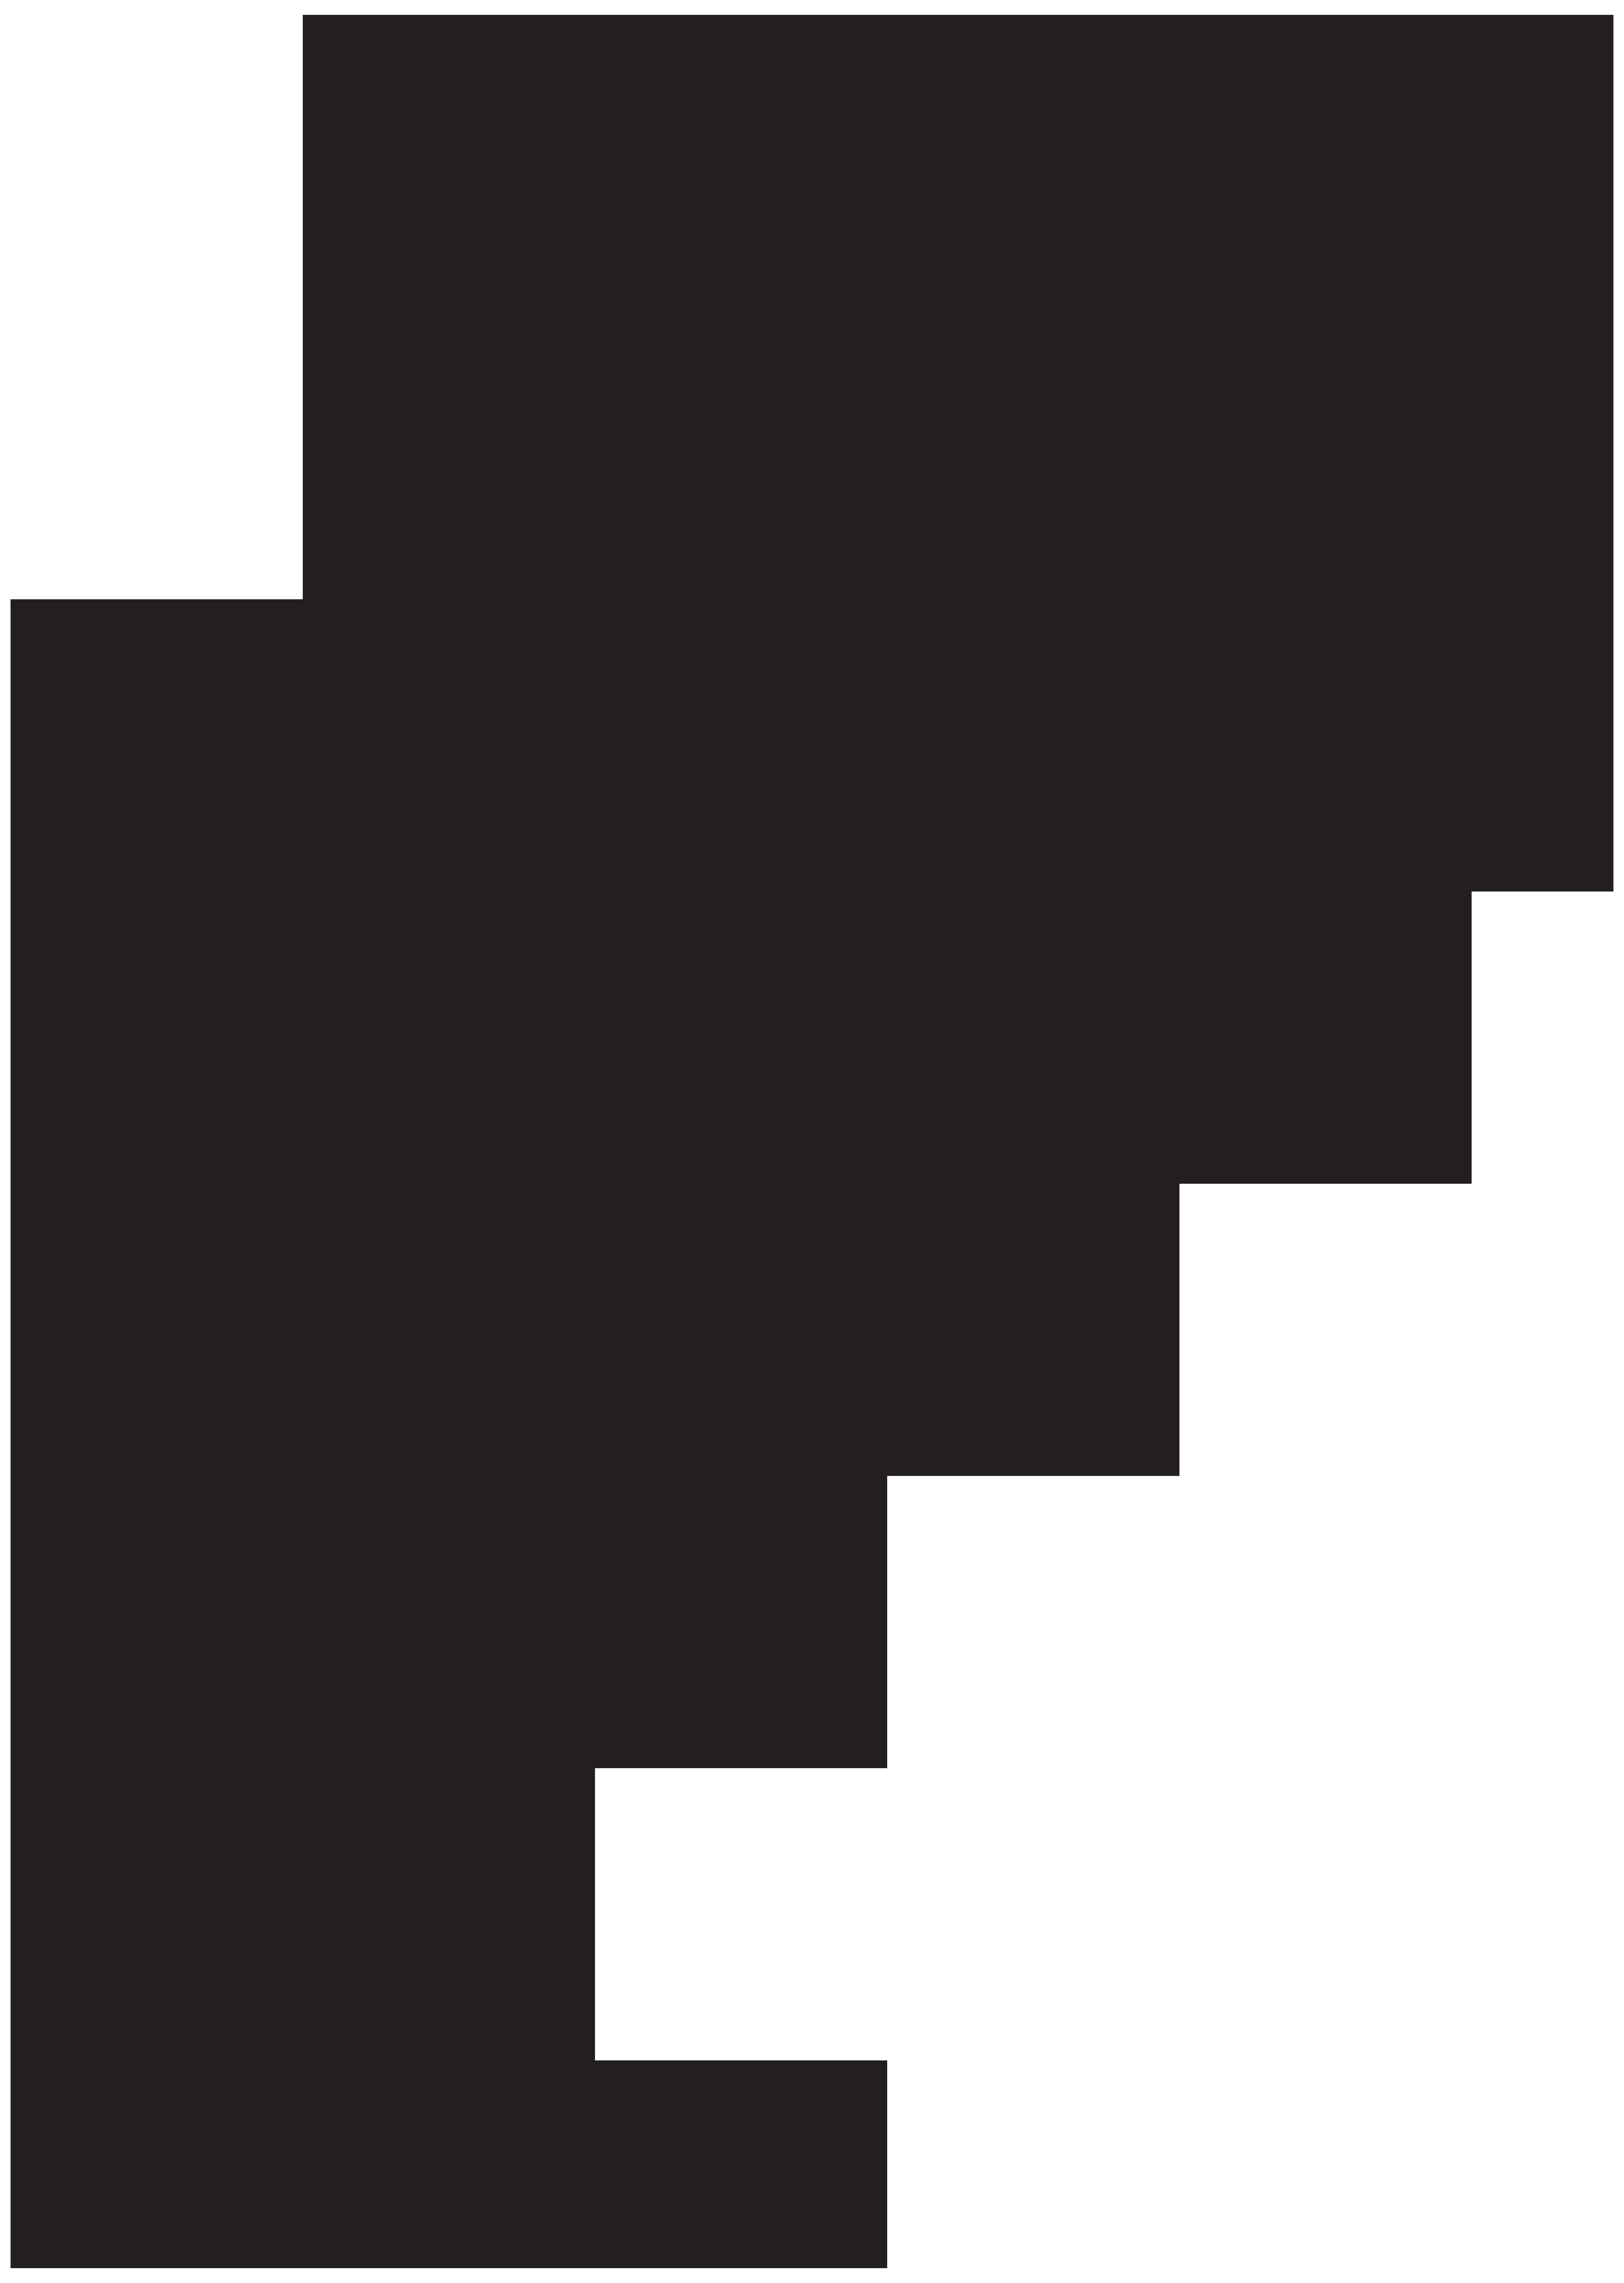 Hockey clipart feild hockey. Player silhouette png clip